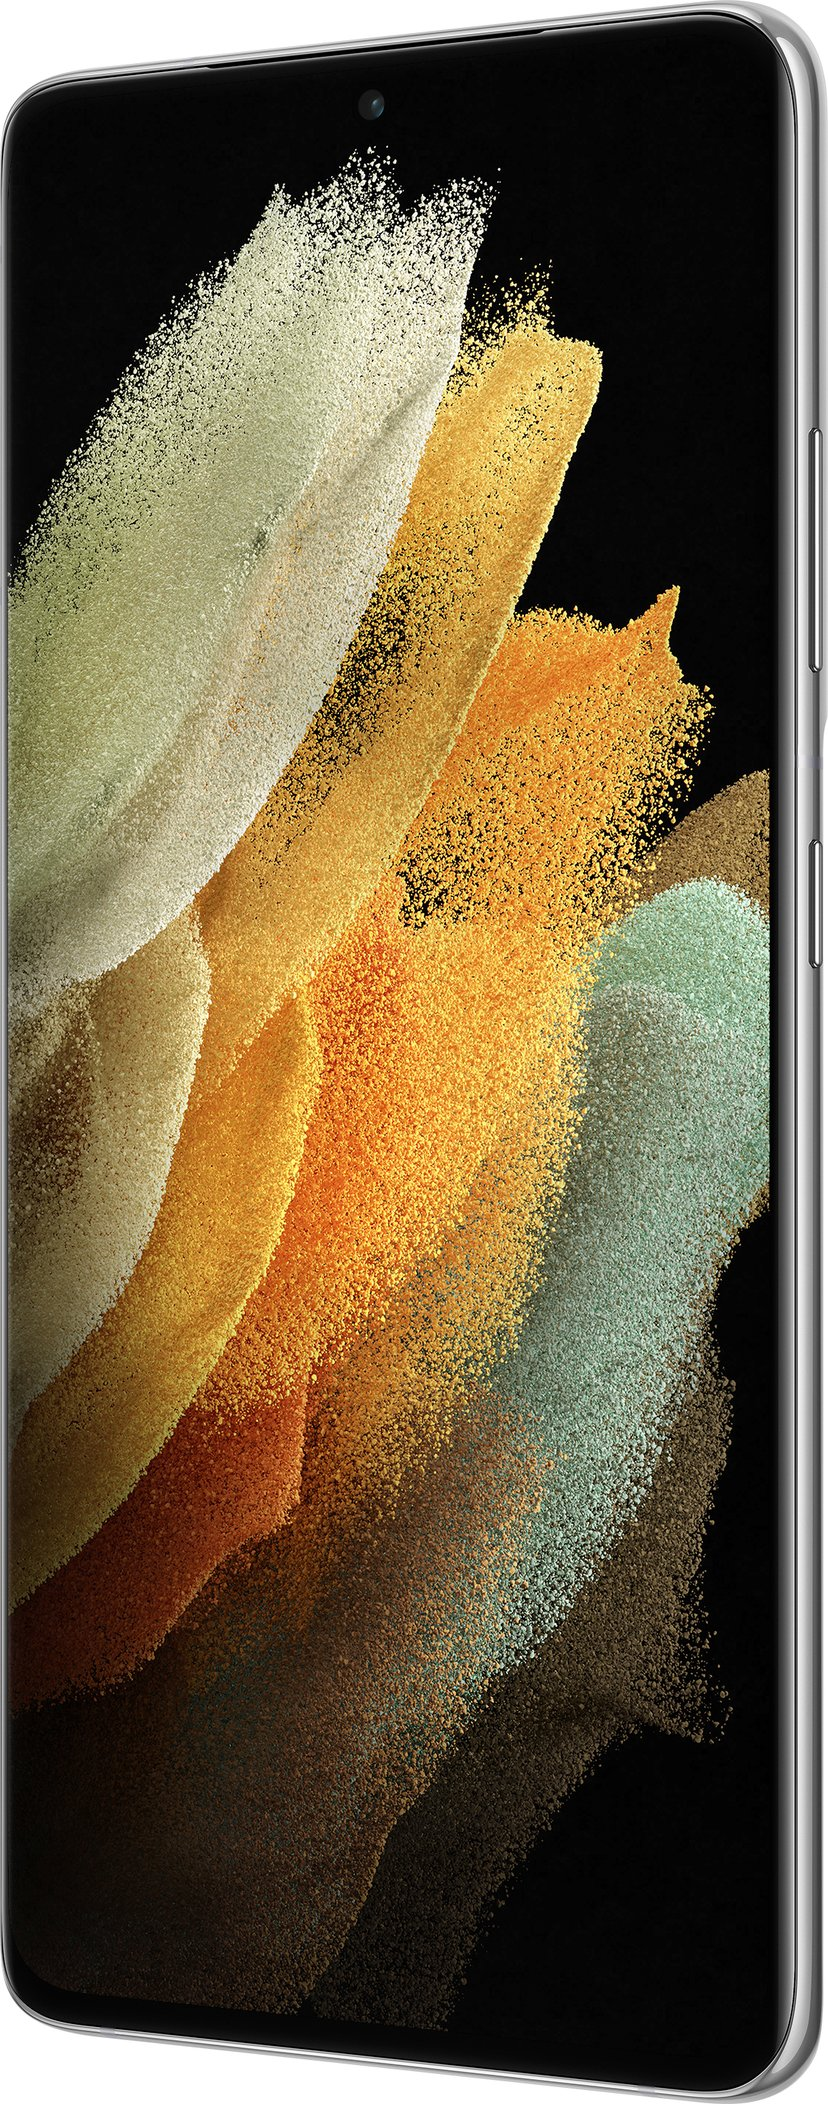 Samsung Galaxy S21 Ultra 5G 512GB Kaksois-SIM Haamun hopea